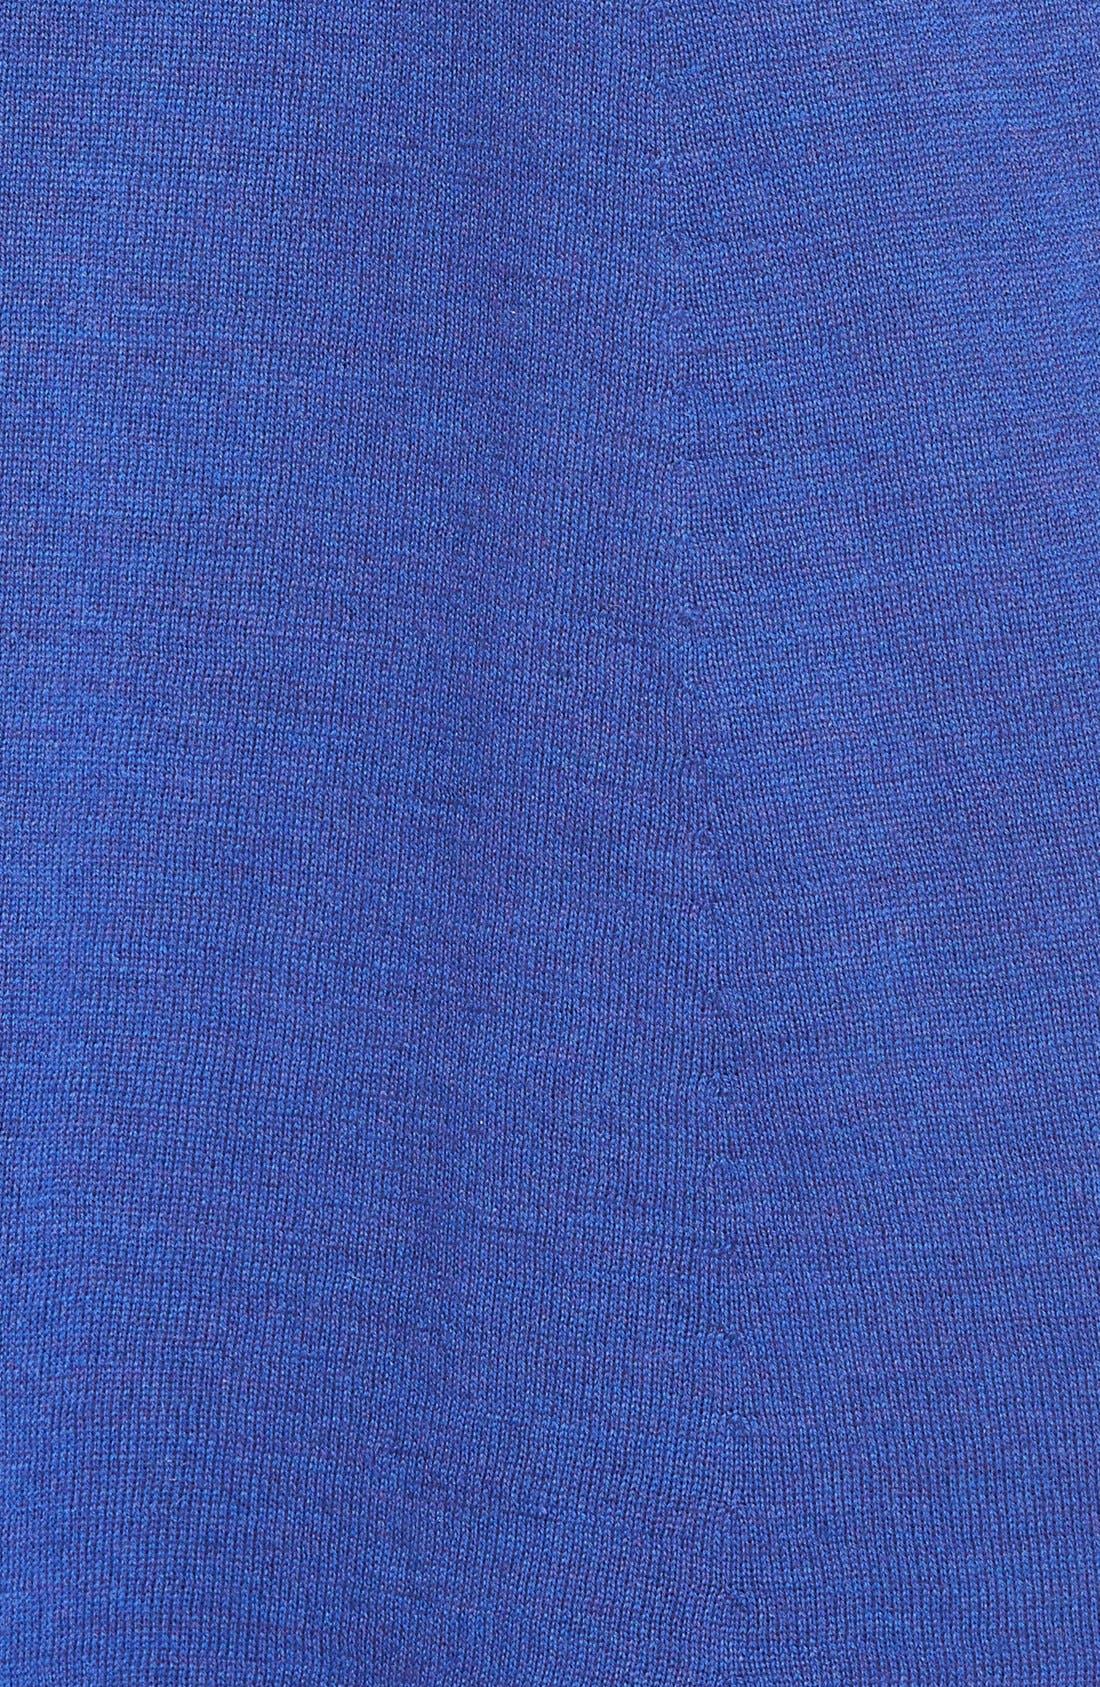 Alternate Image 5  - Eileen Fisher Fine Merino Tunic (Online Only)